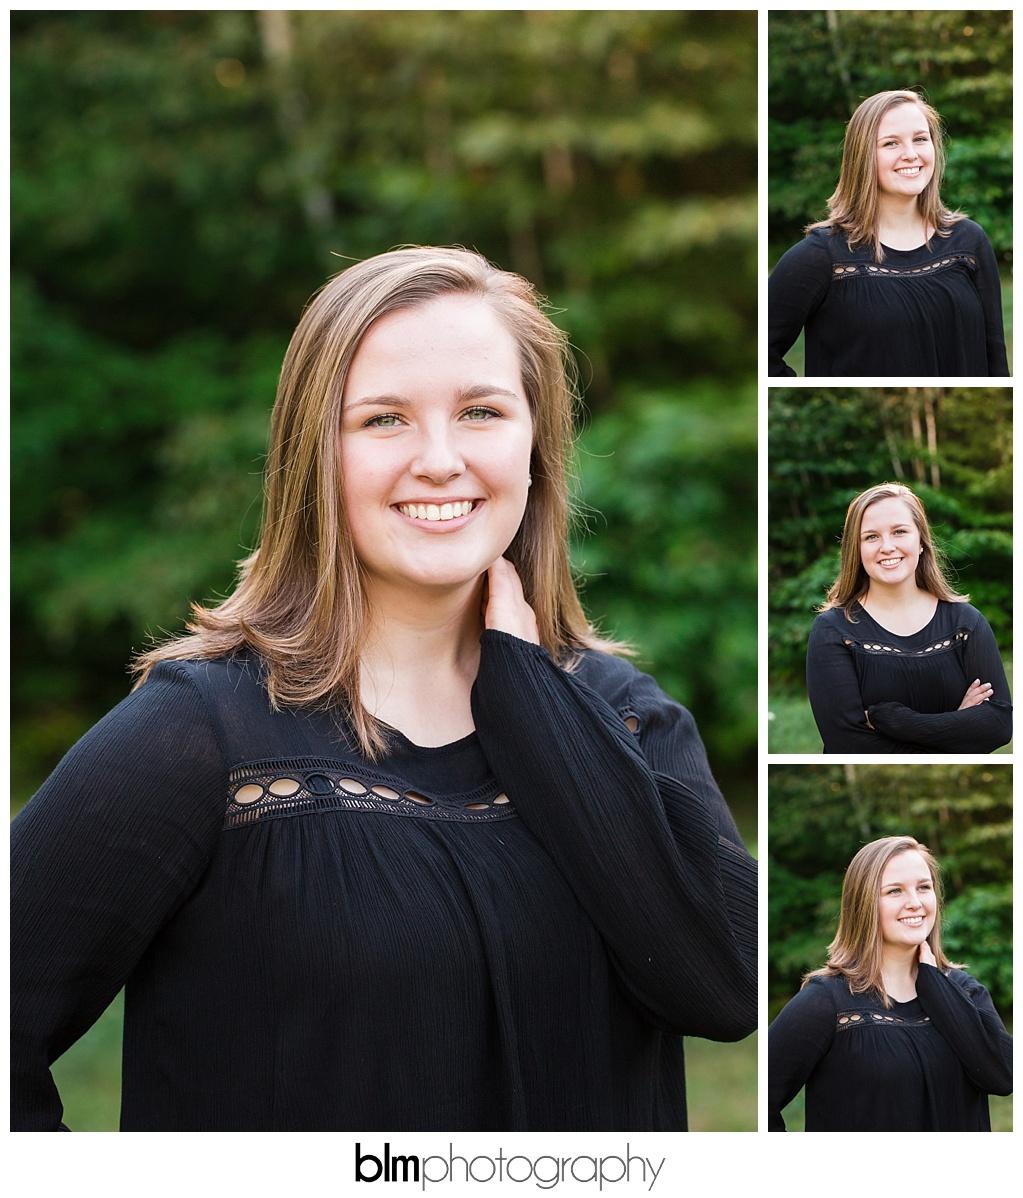 Emma-and-Jordan_Senior-Portraits_082316-0054.jpg